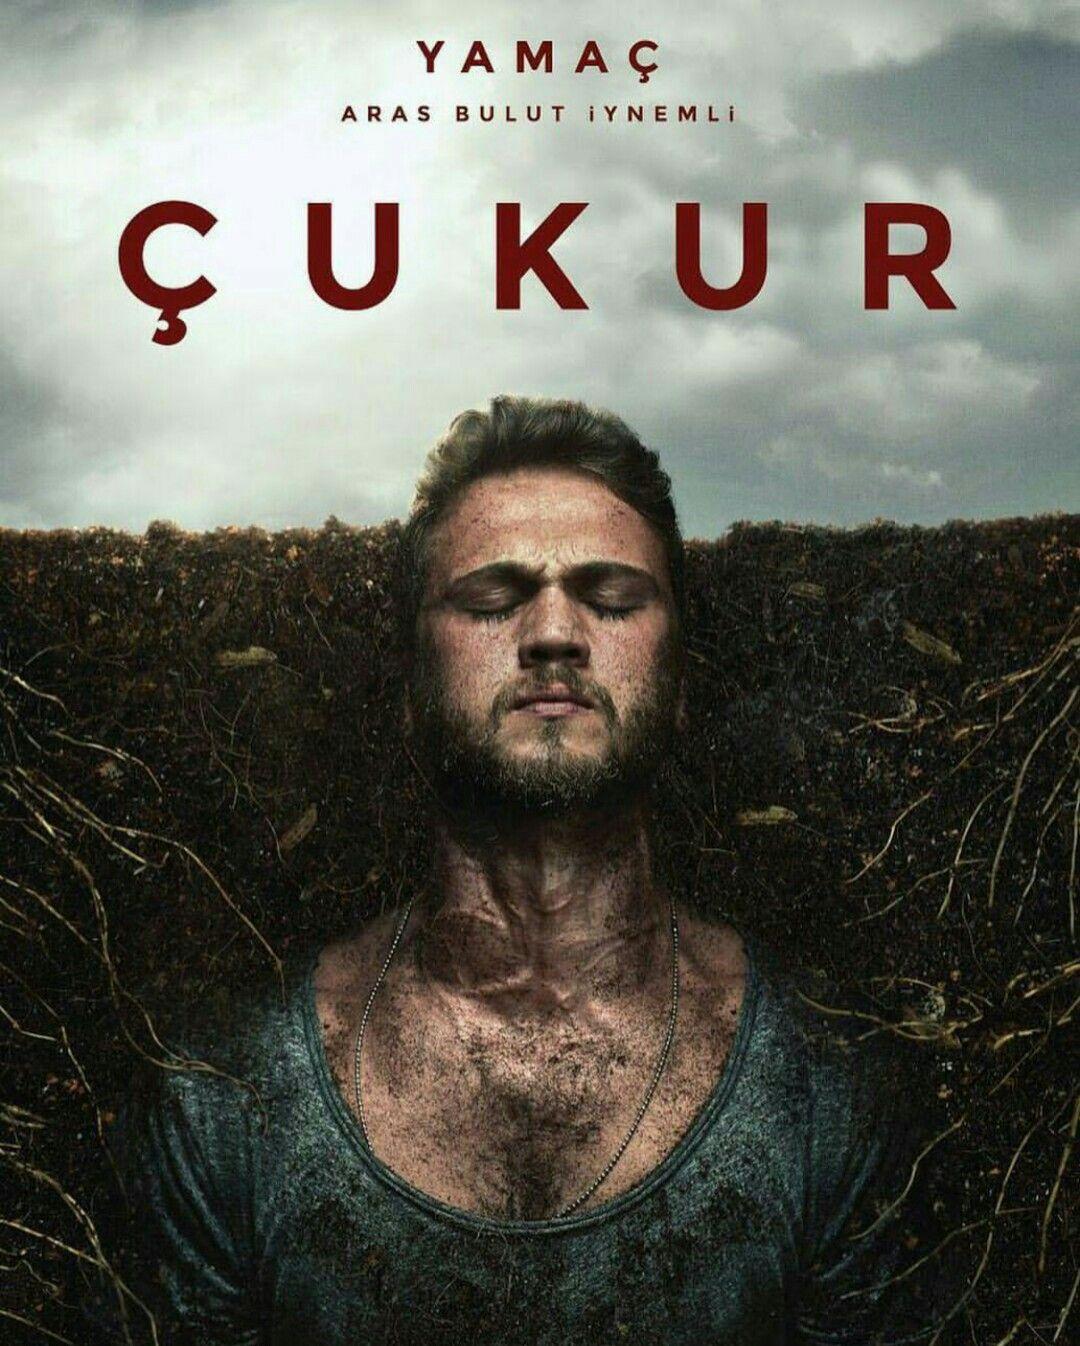 Pin By Turkish Series And Celebrities On Cukur Tv Series Favorite Movies Perfect Beard